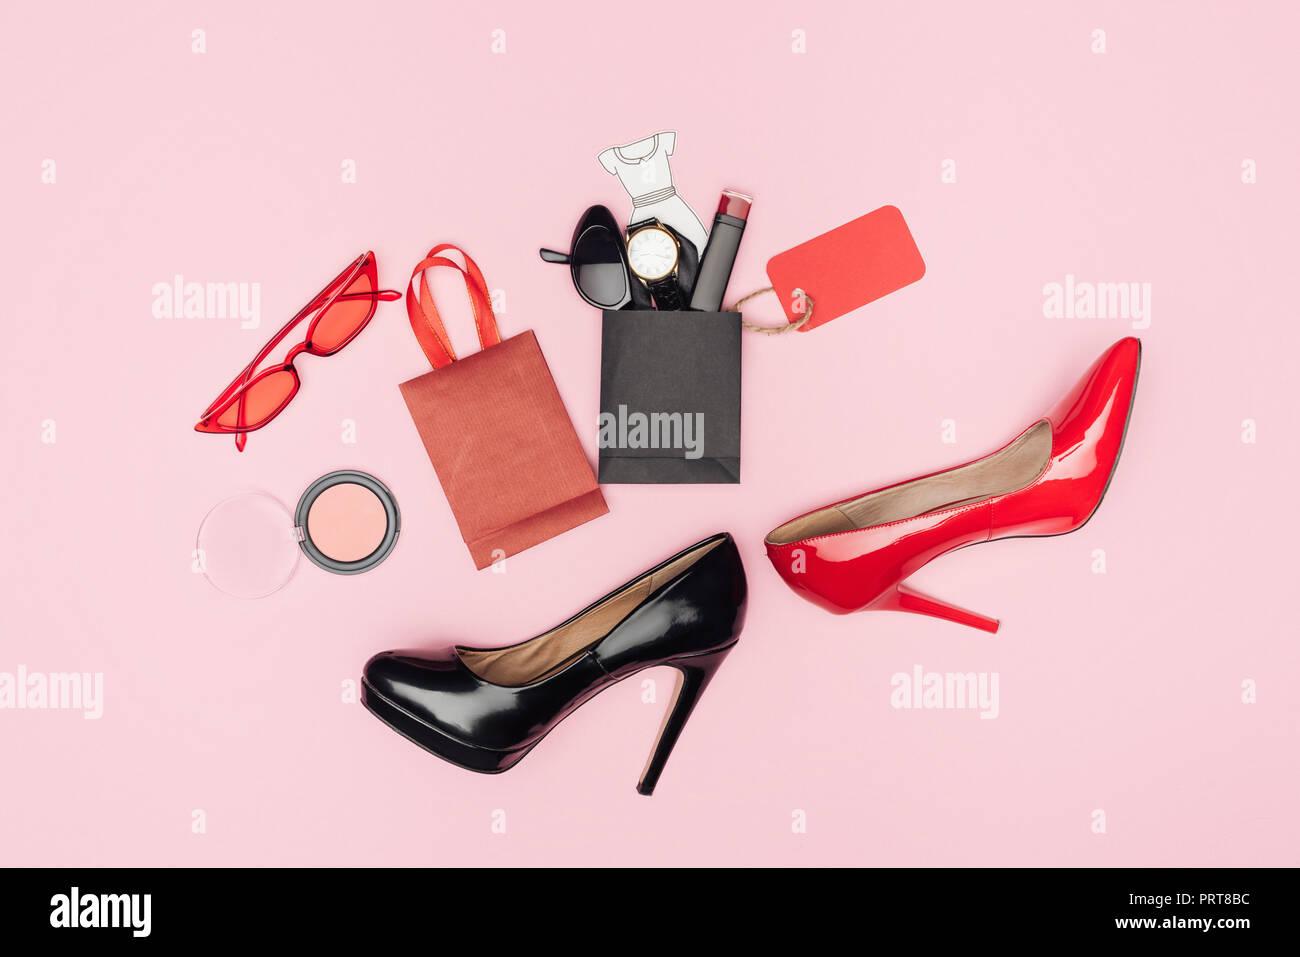 d7a4847ada3 Pink Shoes High Heels Stock Photos & Pink Shoes High Heels Stock ...